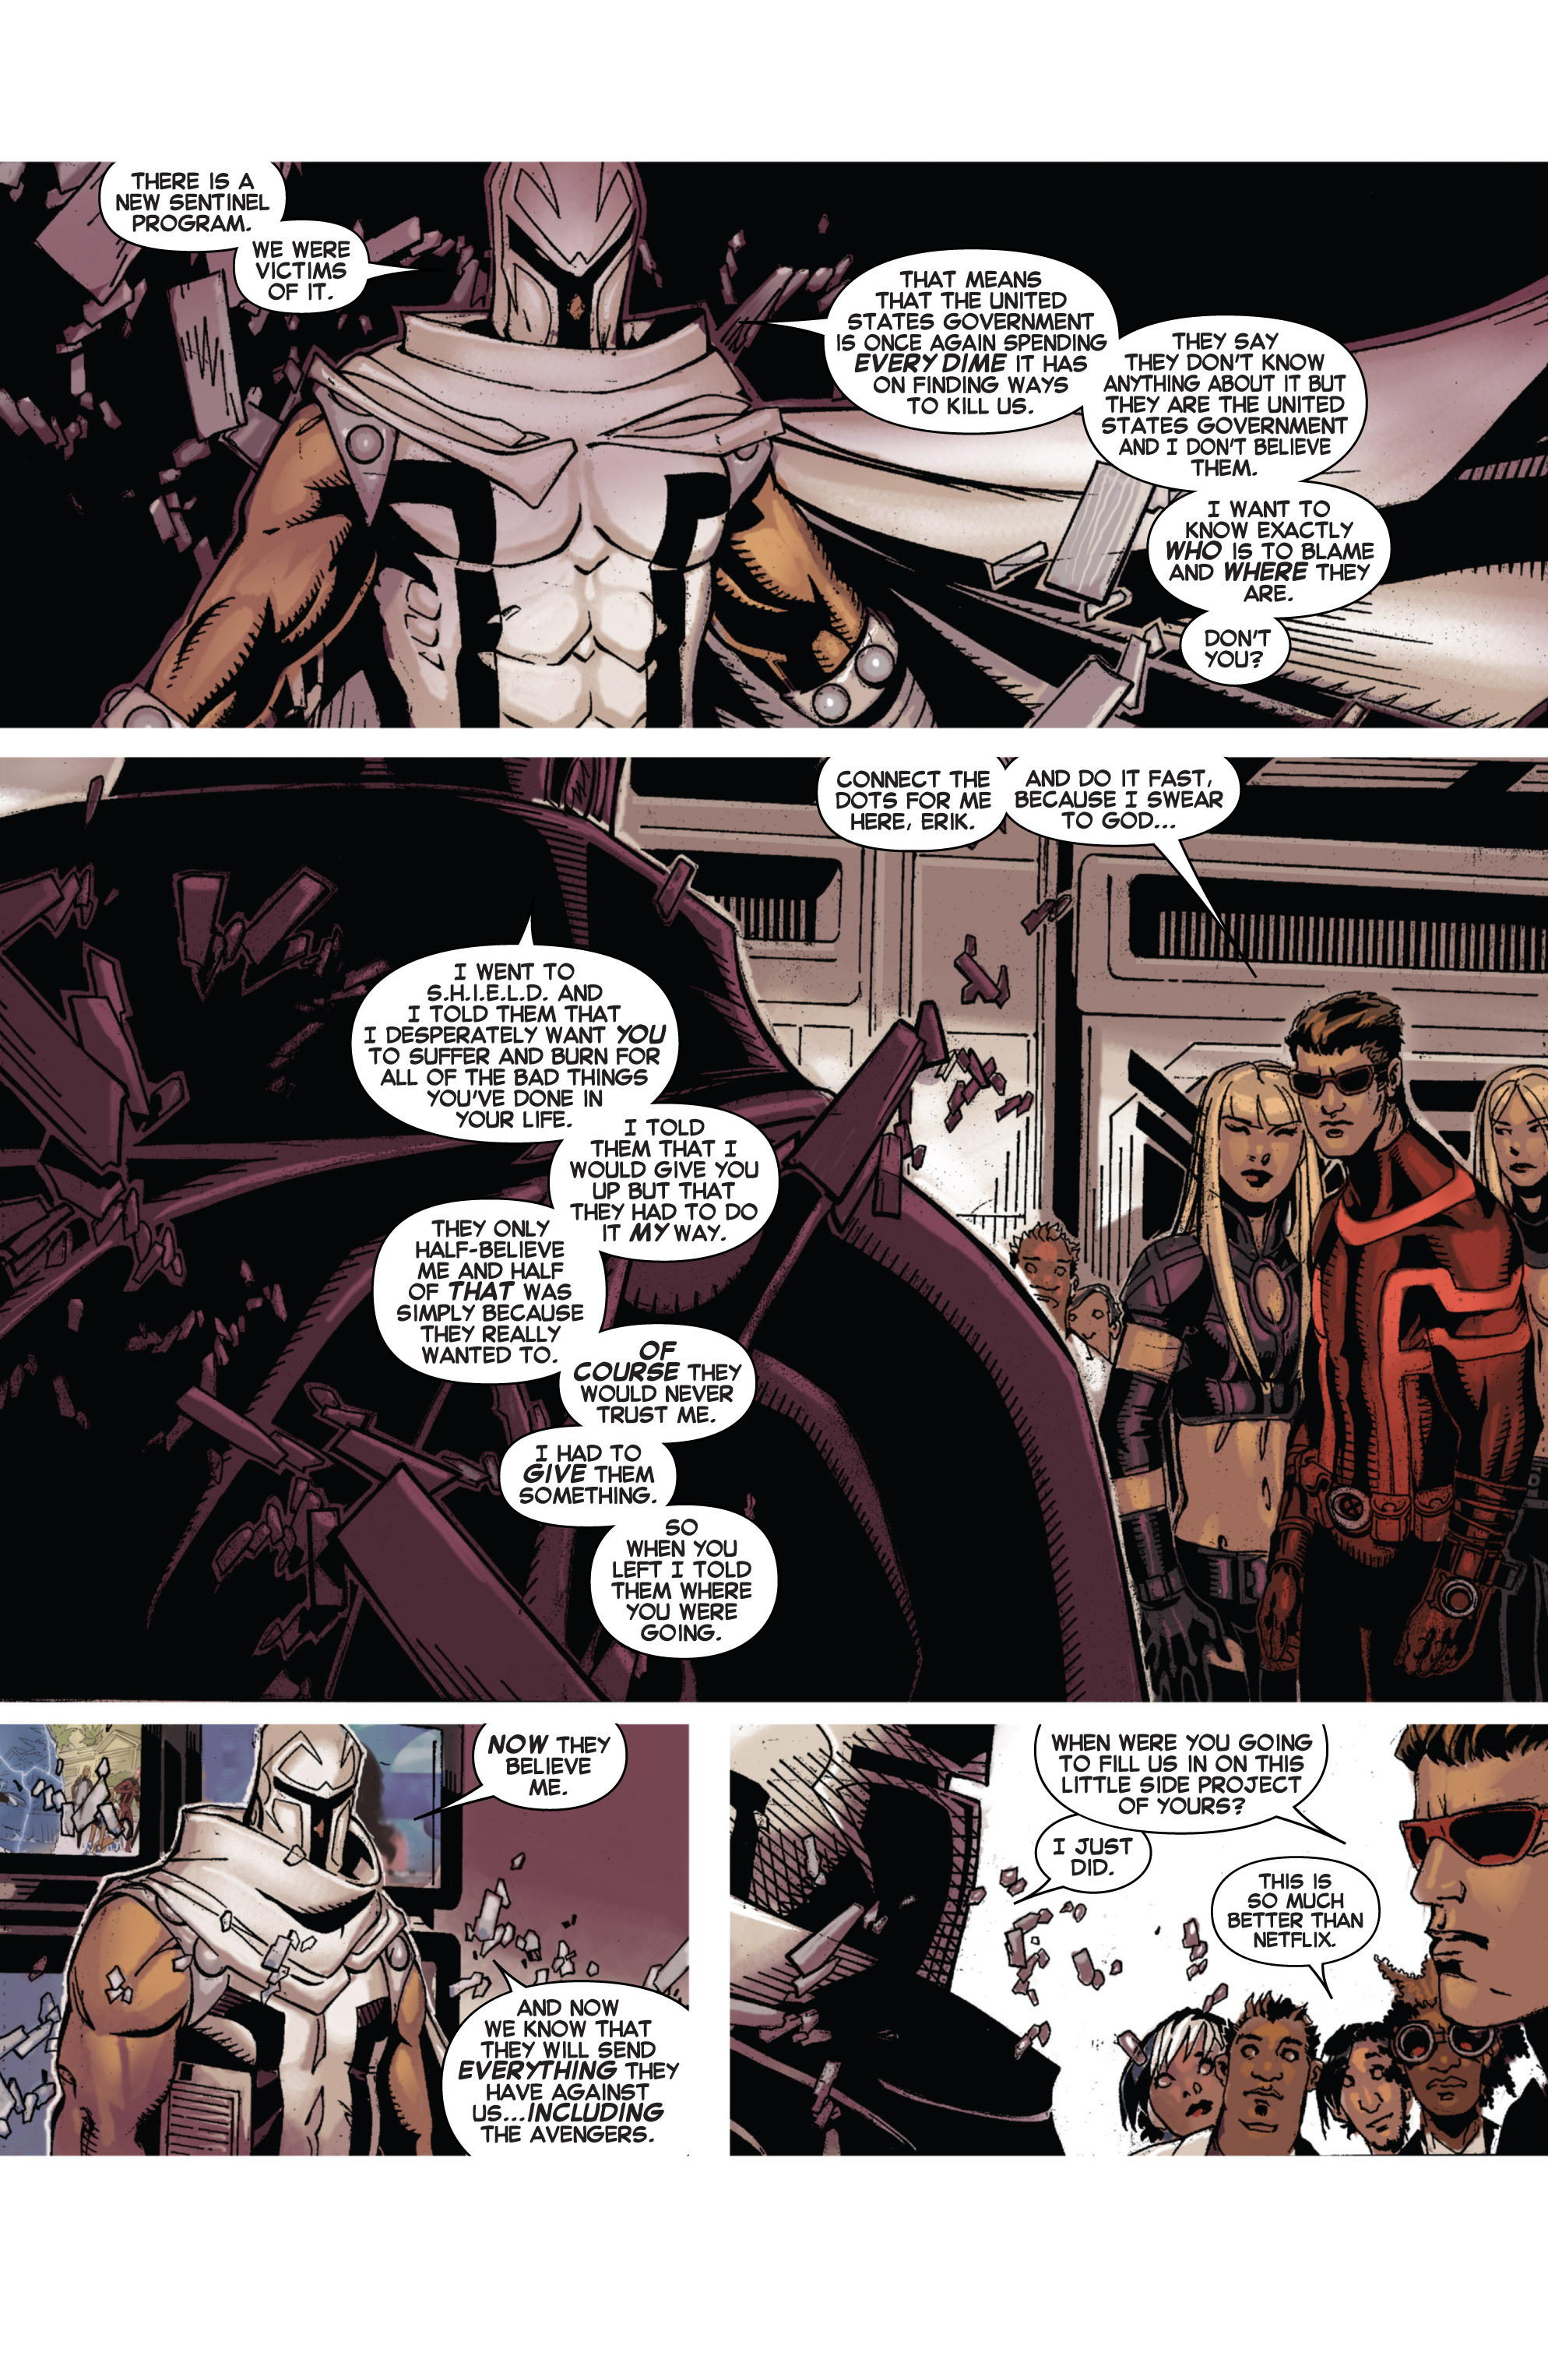 Read online Uncanny X-Men (2013) comic -  Issue # _TPB 1 - Revolution - 60